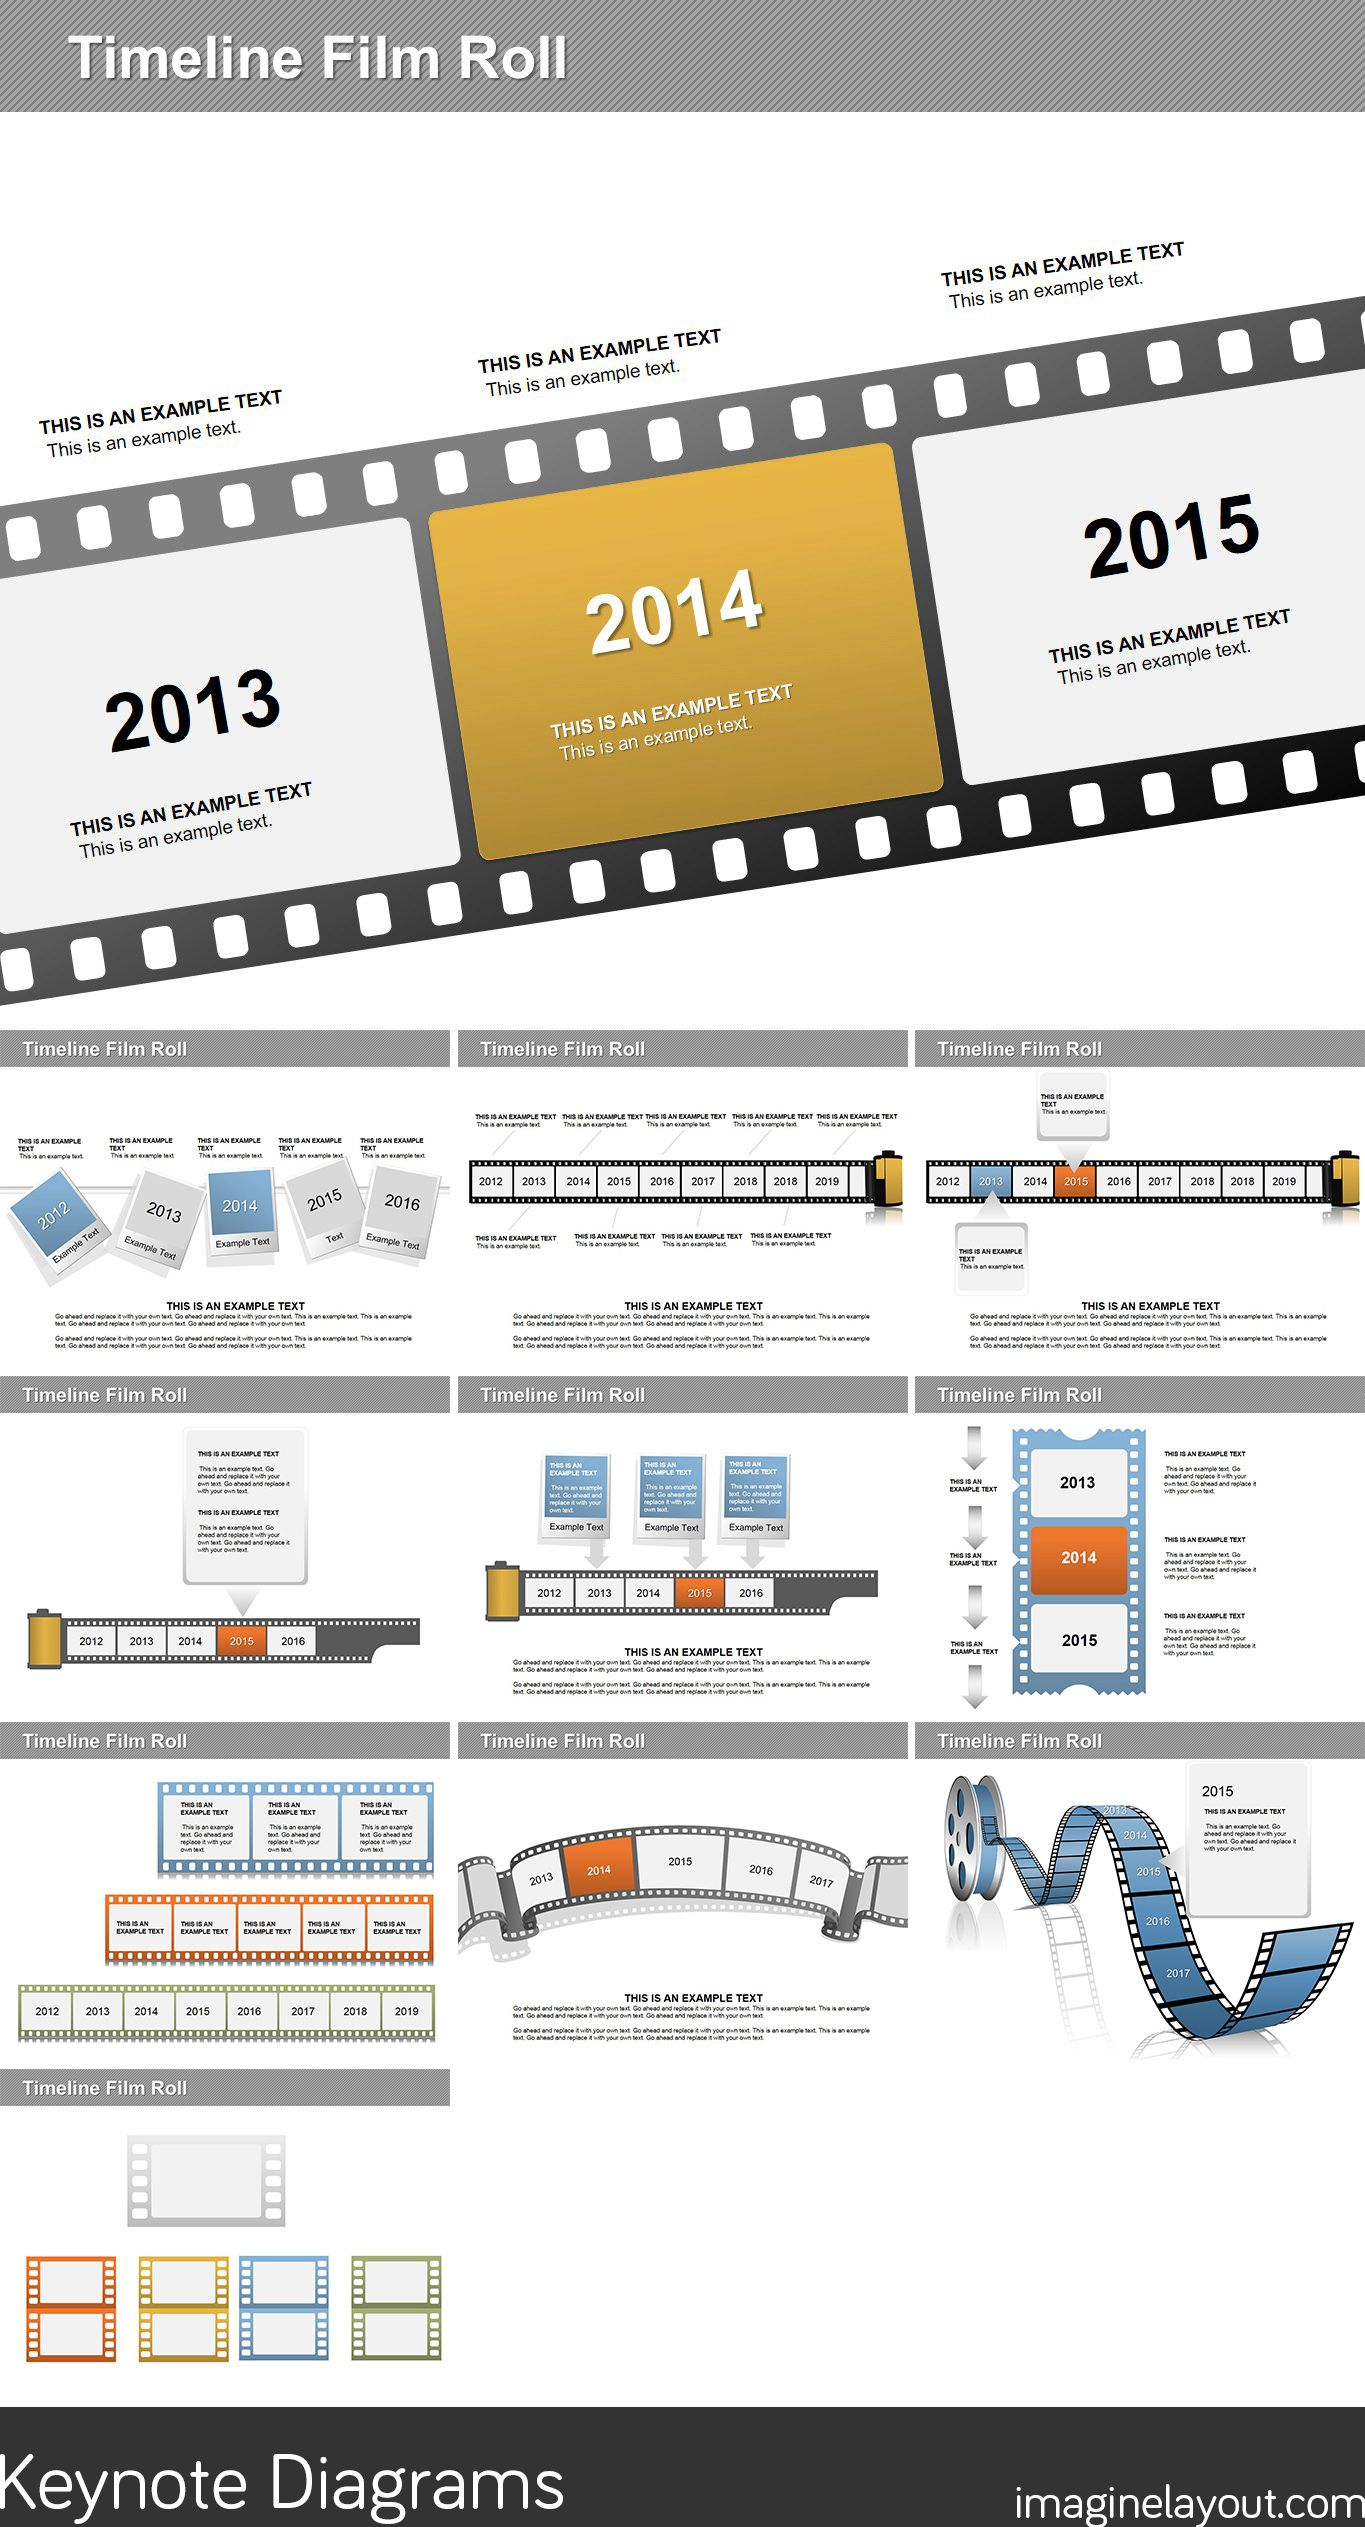 Timeline Film Roll Keynote Diagrams   Keynote Diagrams   Pinterest ...